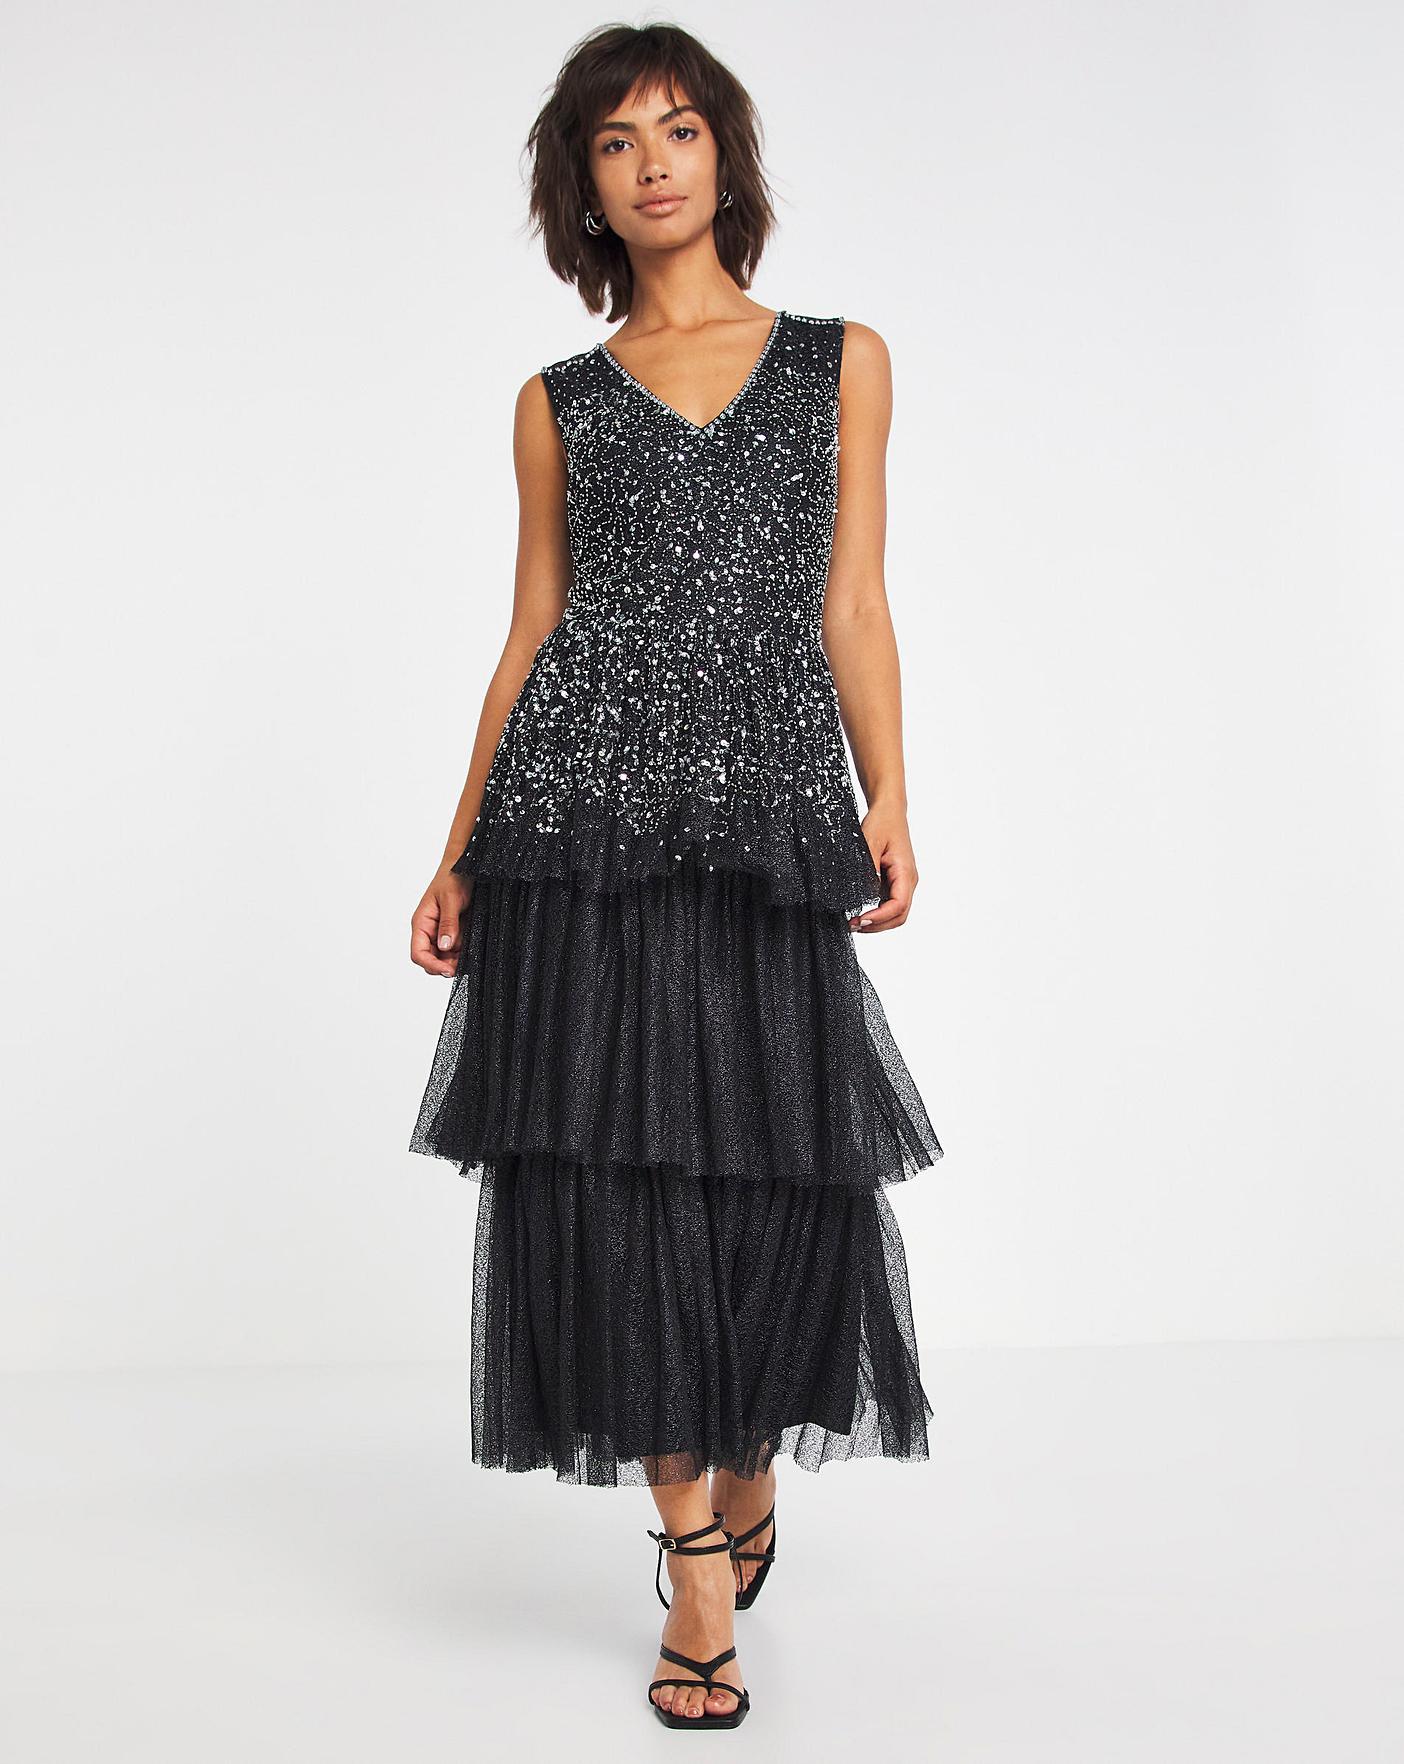 Vintage 1920s Dresses – Where to Buy Joanna Hope Sequin Tiered Prom Dress £130.00 AT vintagedancer.com